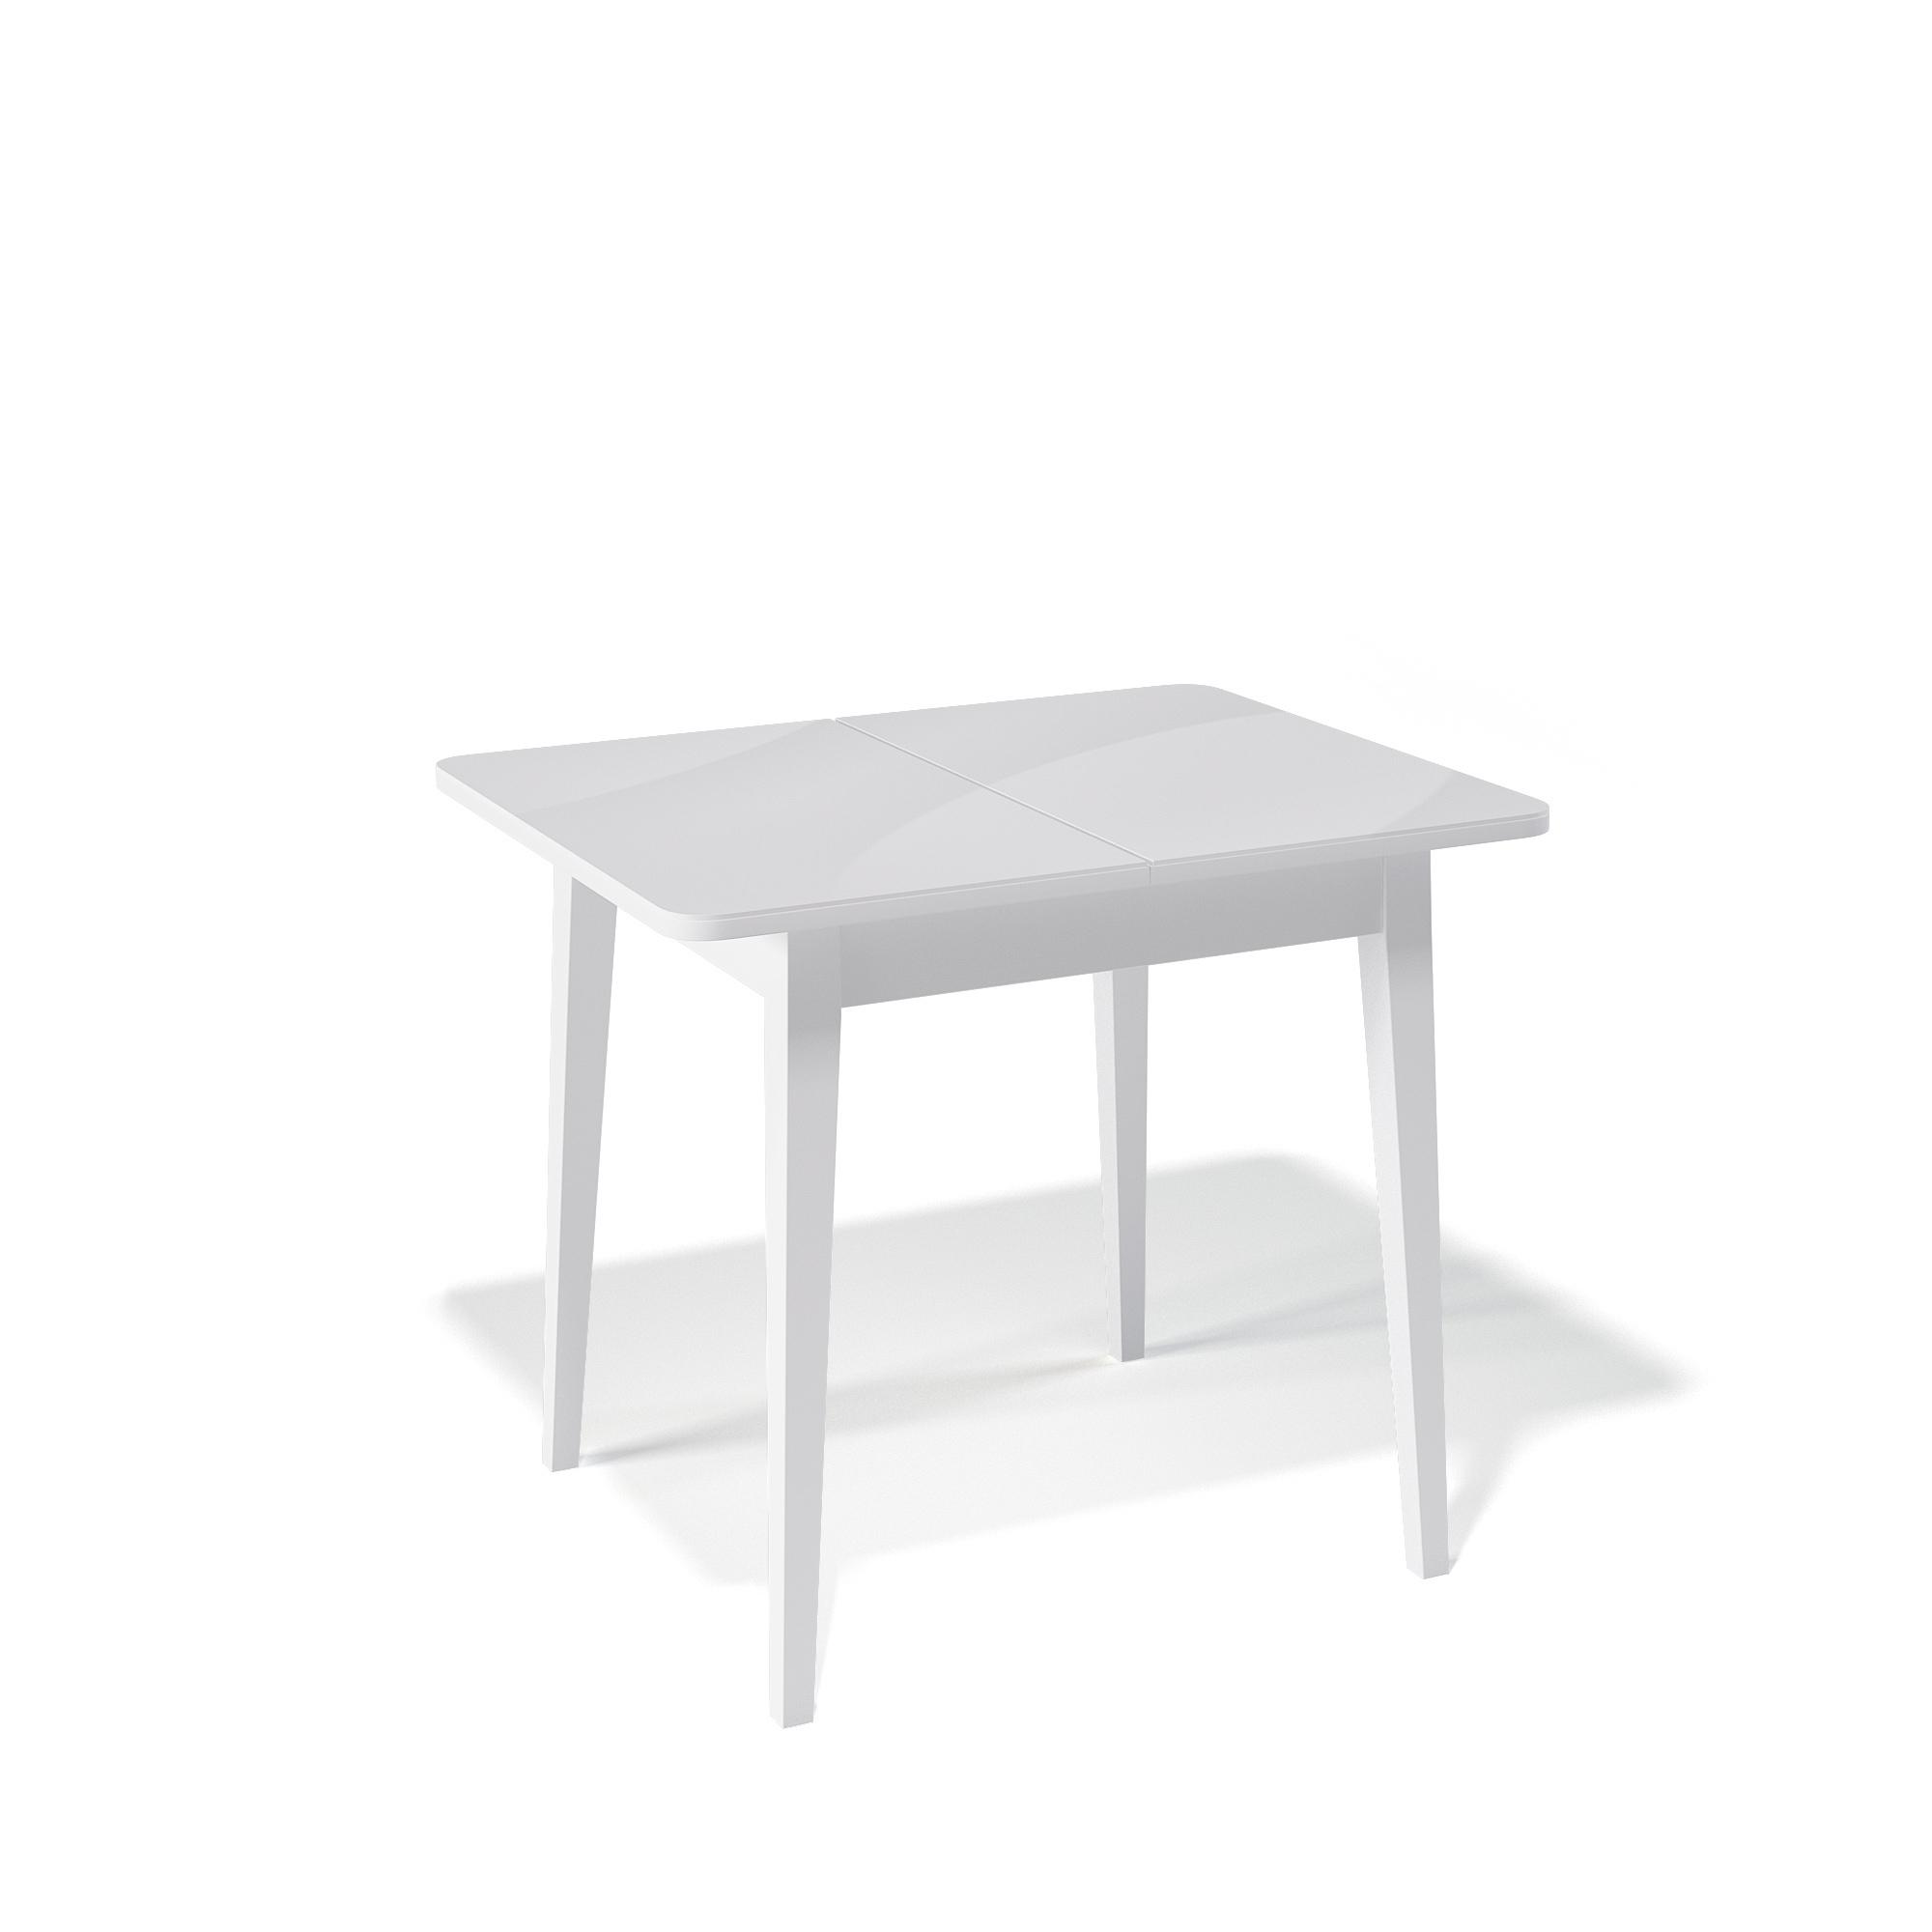 Стол Kenner 900M для кухни, раздвижной, стеклянный, белый глянцевый